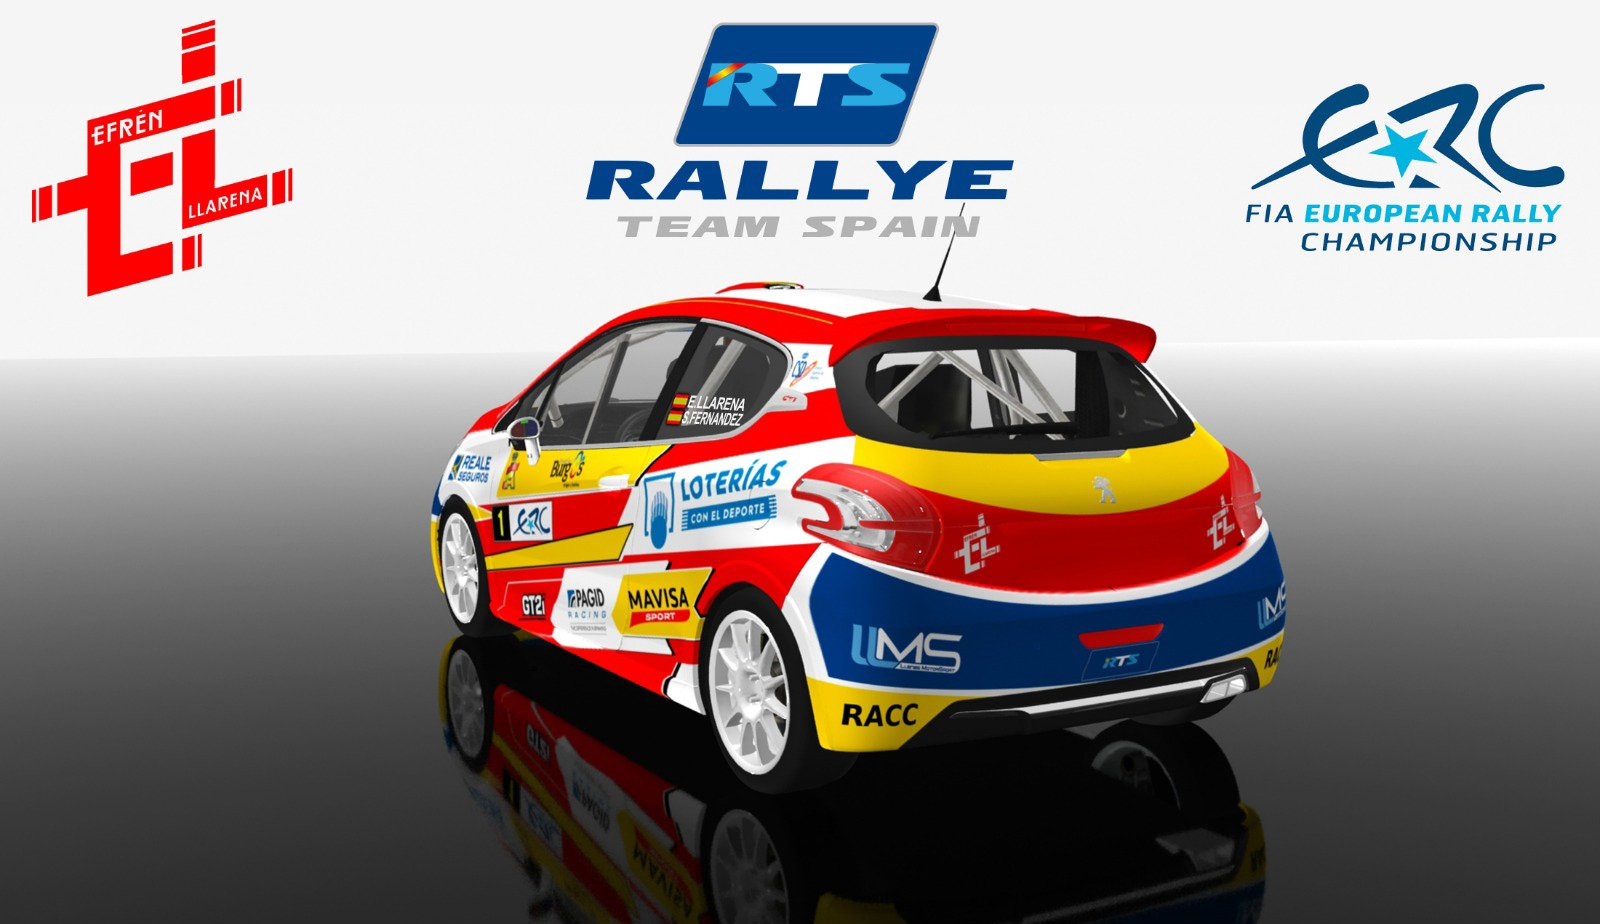 FIA European Rally Championship: Temporada 2019 - Página 3 D19yglIW0AA6qmK